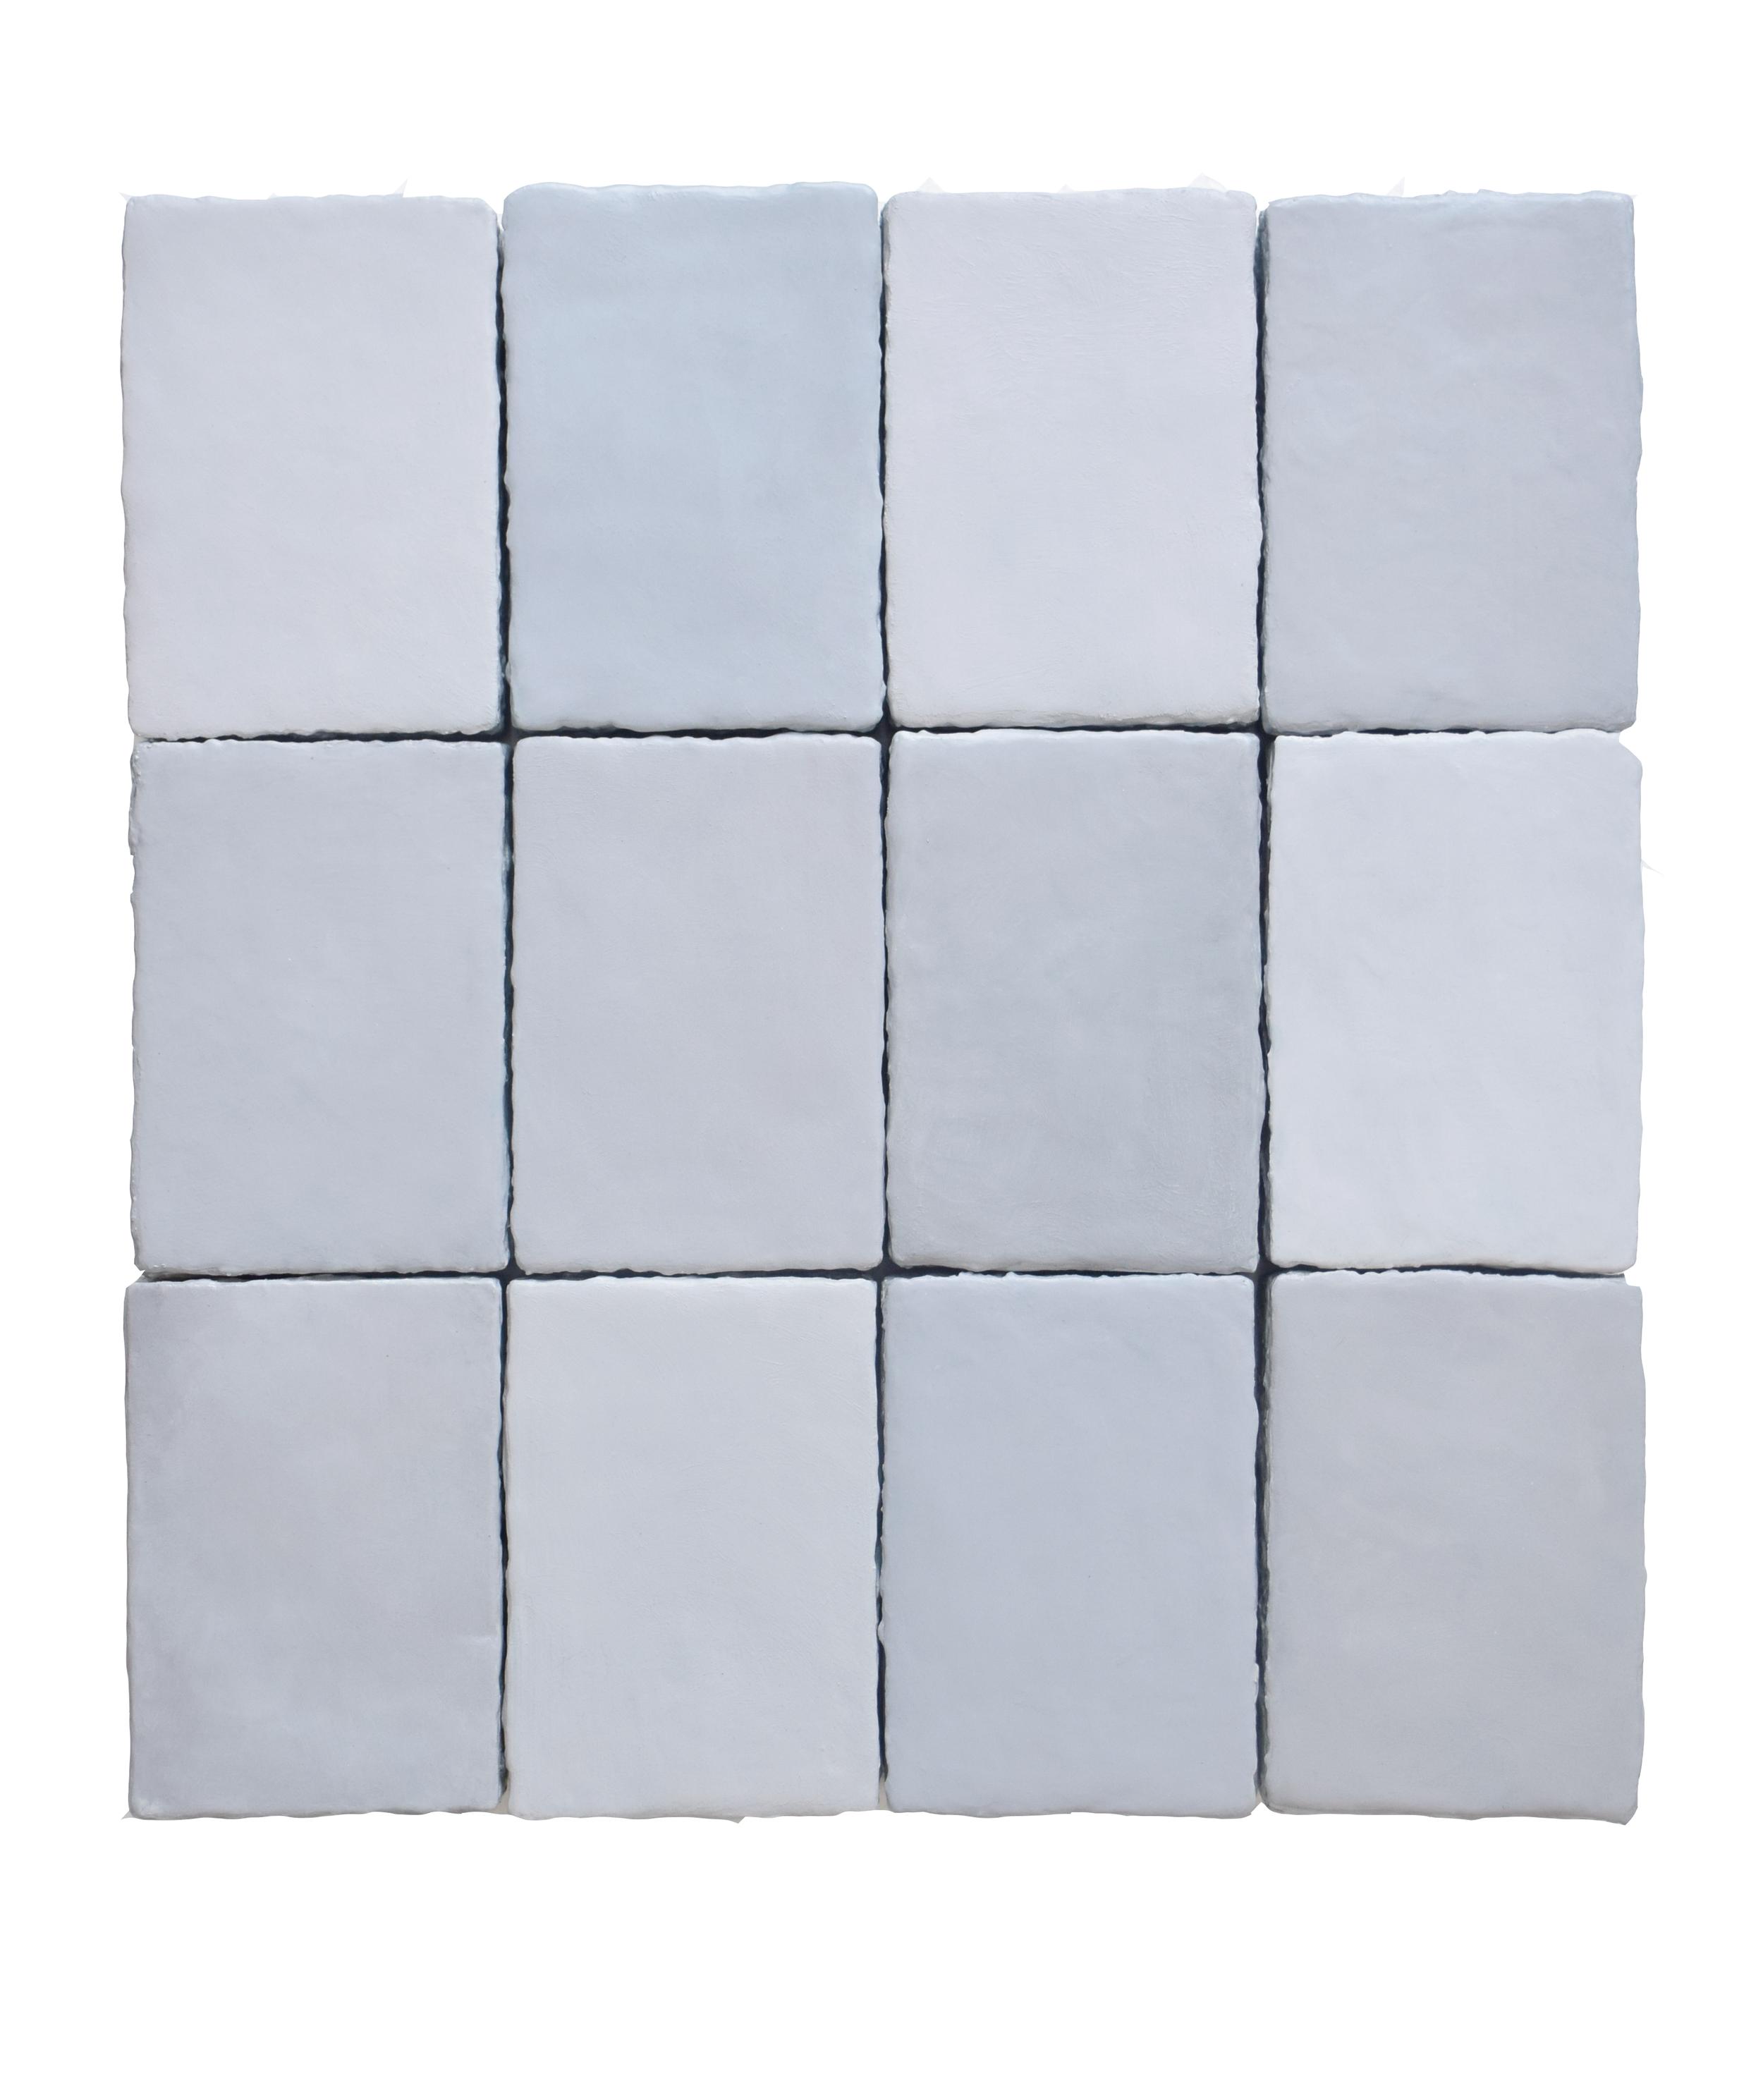 Stan Van Steendam, 'Morro', 2018, varnish, pigments and plaster on board, 39 x 42 x 3,5 cm (12 separate pieces)